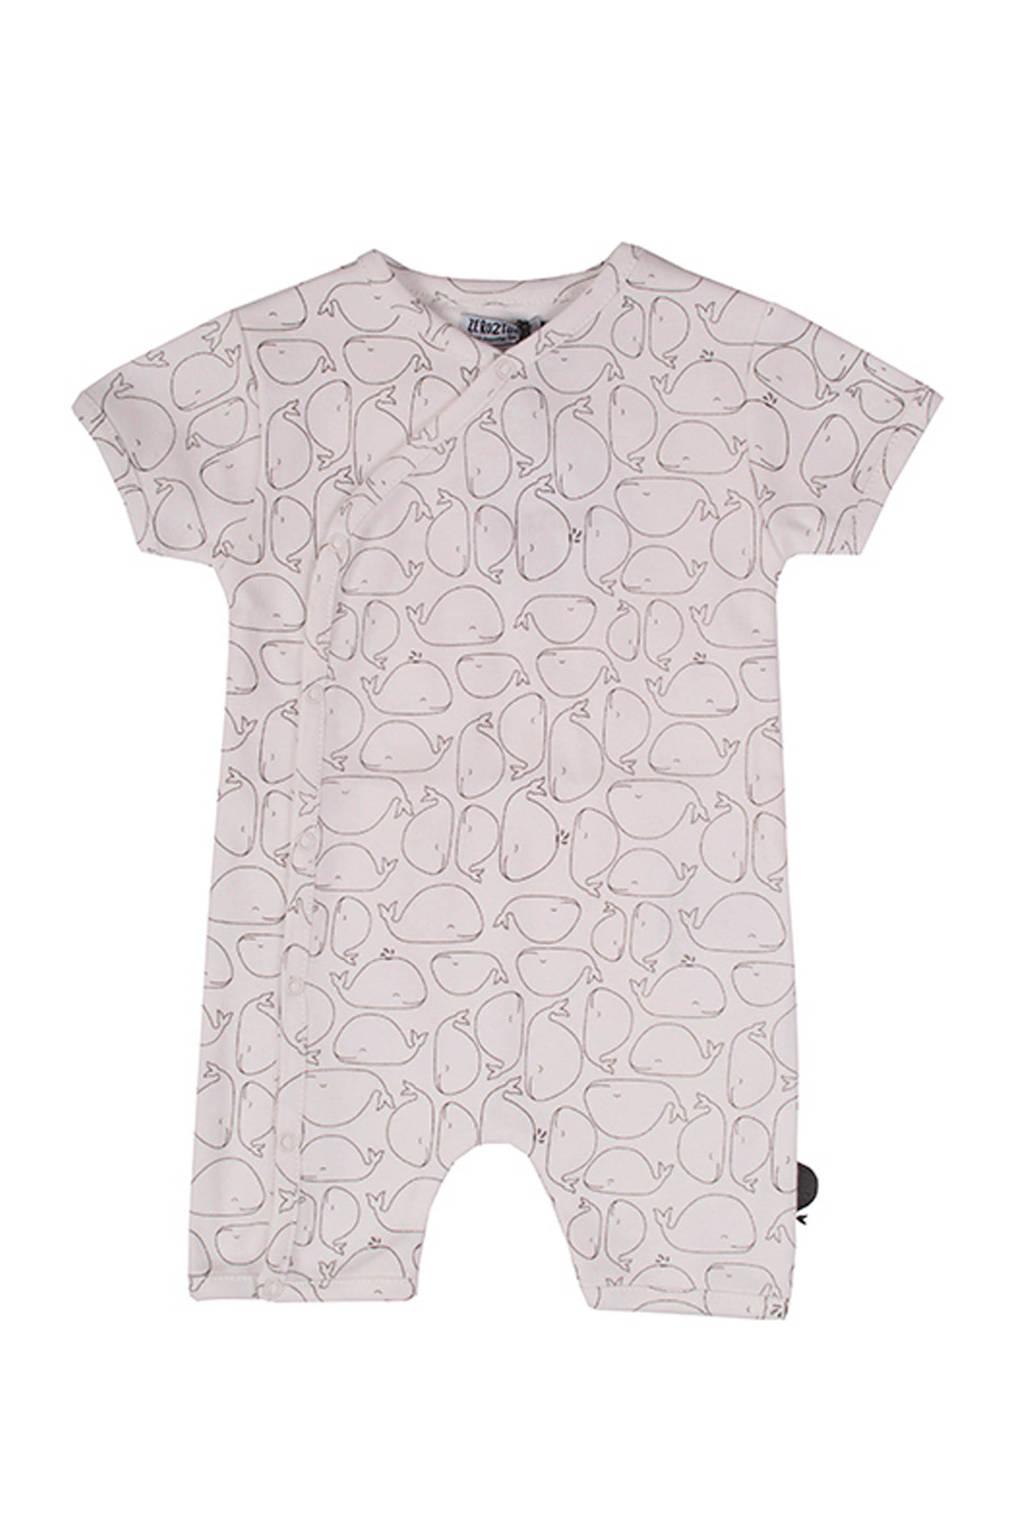 Zero2three baby boxpak Whale met all over print wit/grijs, Wit/grijs